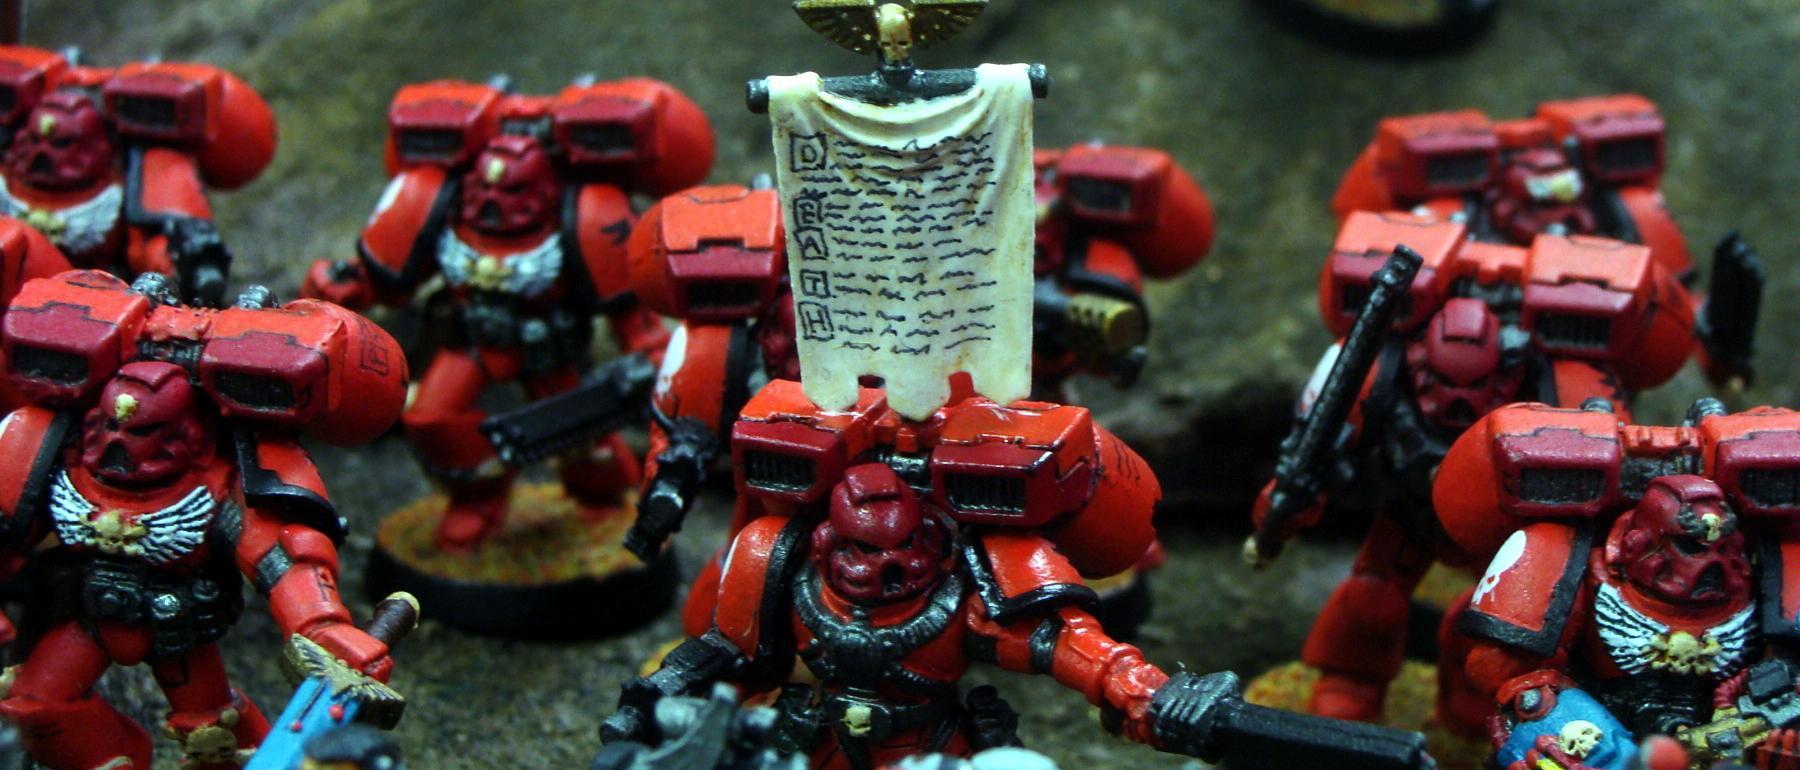 Blood Angels, Freehand, Kirasu, Space Marines, Warhammer 40,000